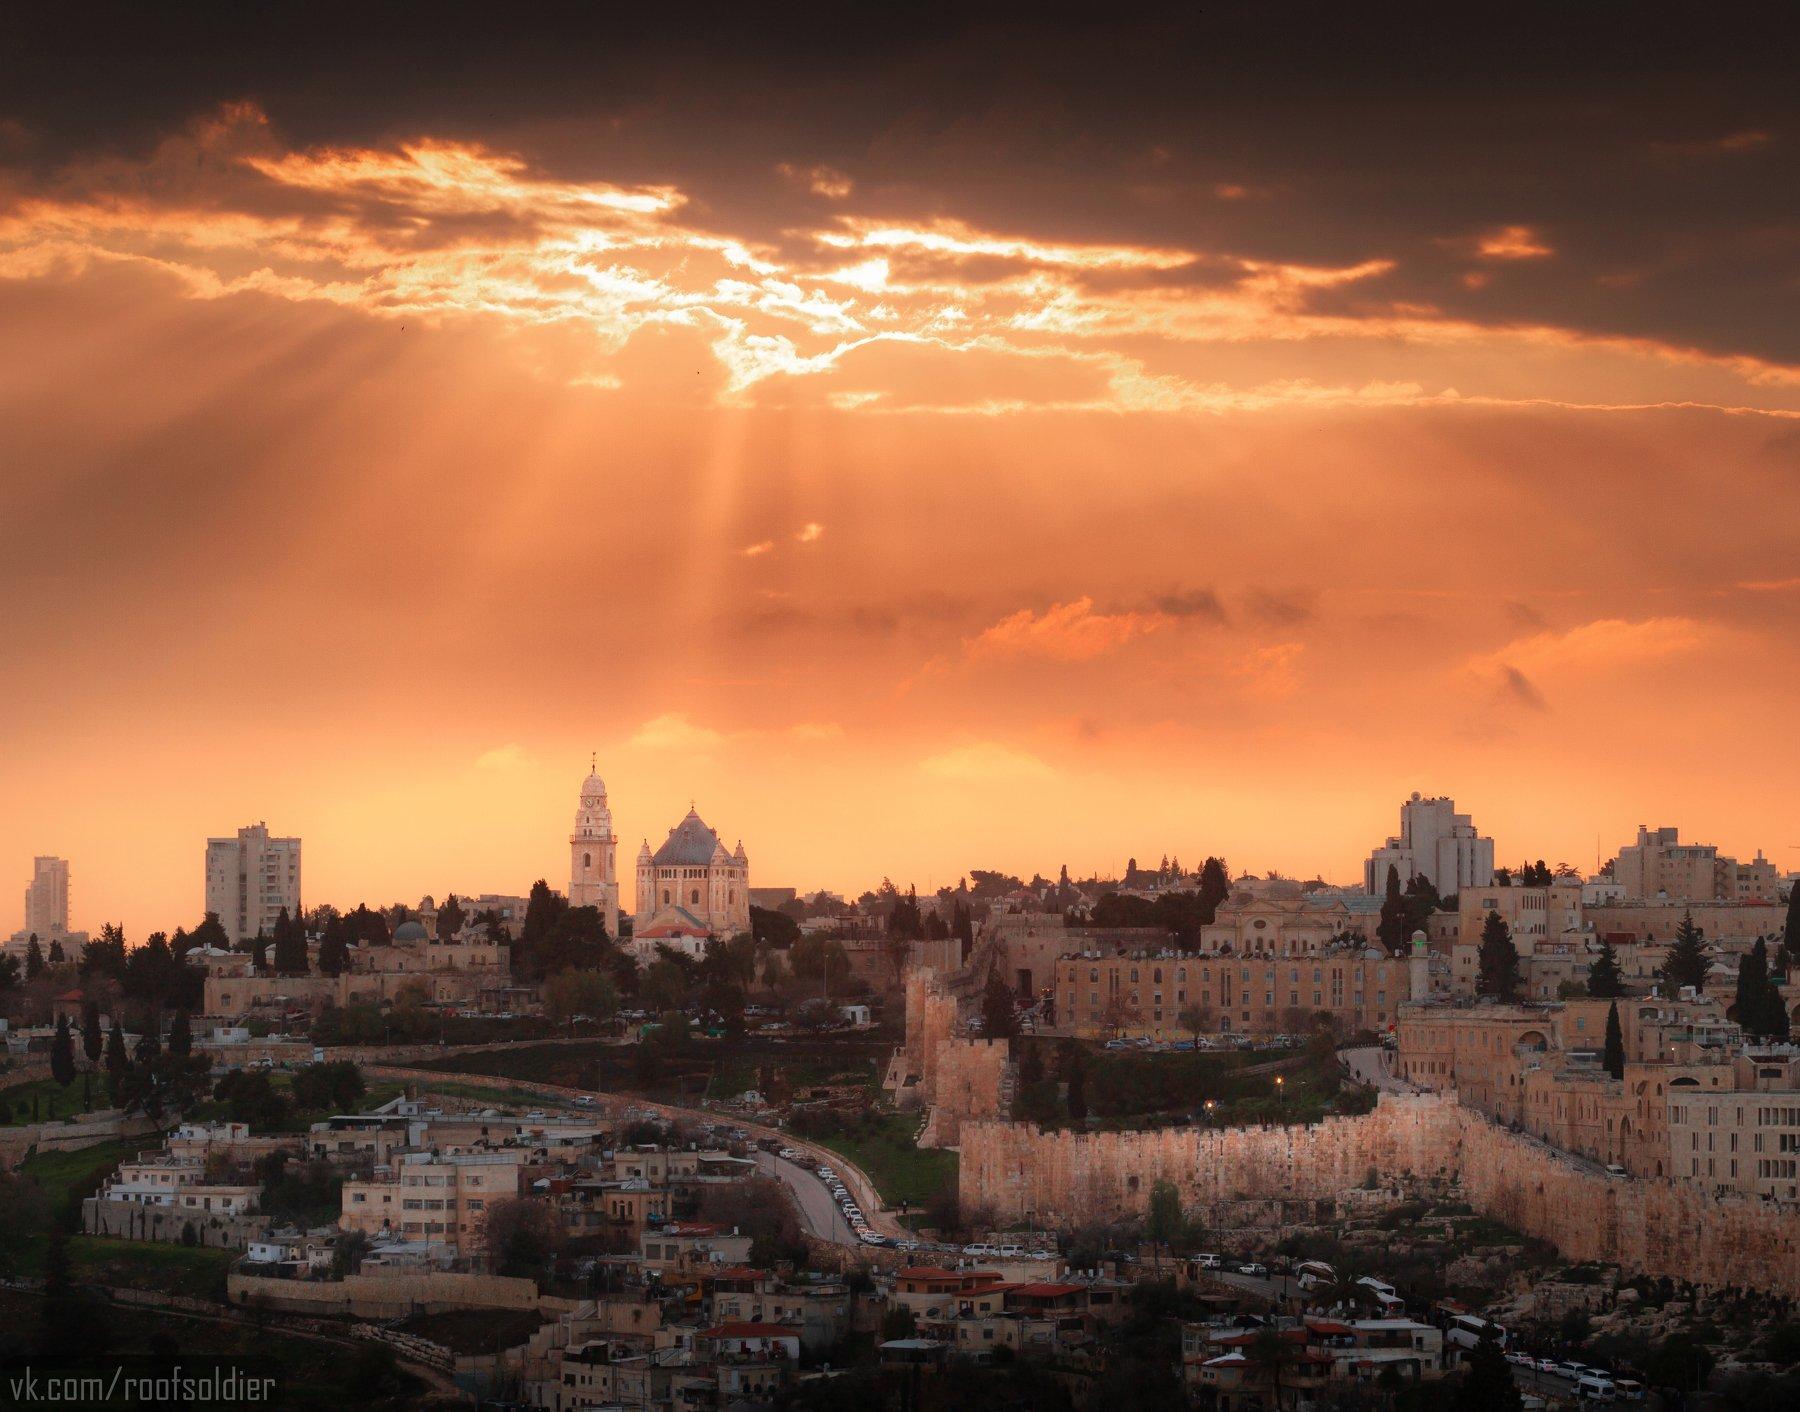 Иерусалим, Израиль, Палестина, Старый Город, Архитектура, религия, храм, церковь, закат, рассвет, город, пейзаж, открытка, крыша, architecture, urban, sunset, sunrise, religion, church, cathedral, old city, jerusalem, israel, palestine, Голубев Алексей